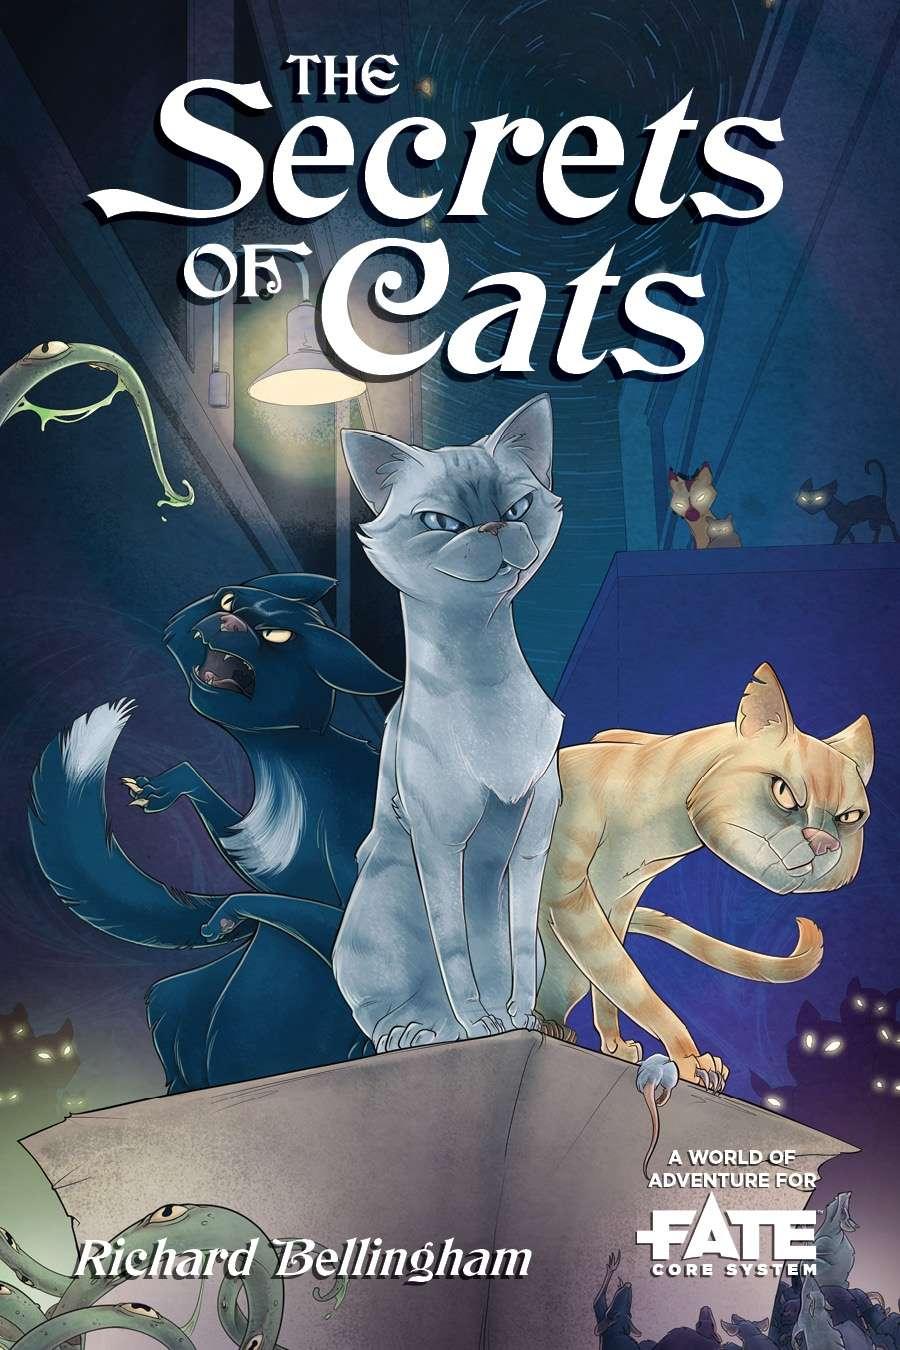 The Secrets of Cats • A World of Adventure for Fate Core - Evil Hat  Productions, LLC | Fate Core | DriveThruRPG com